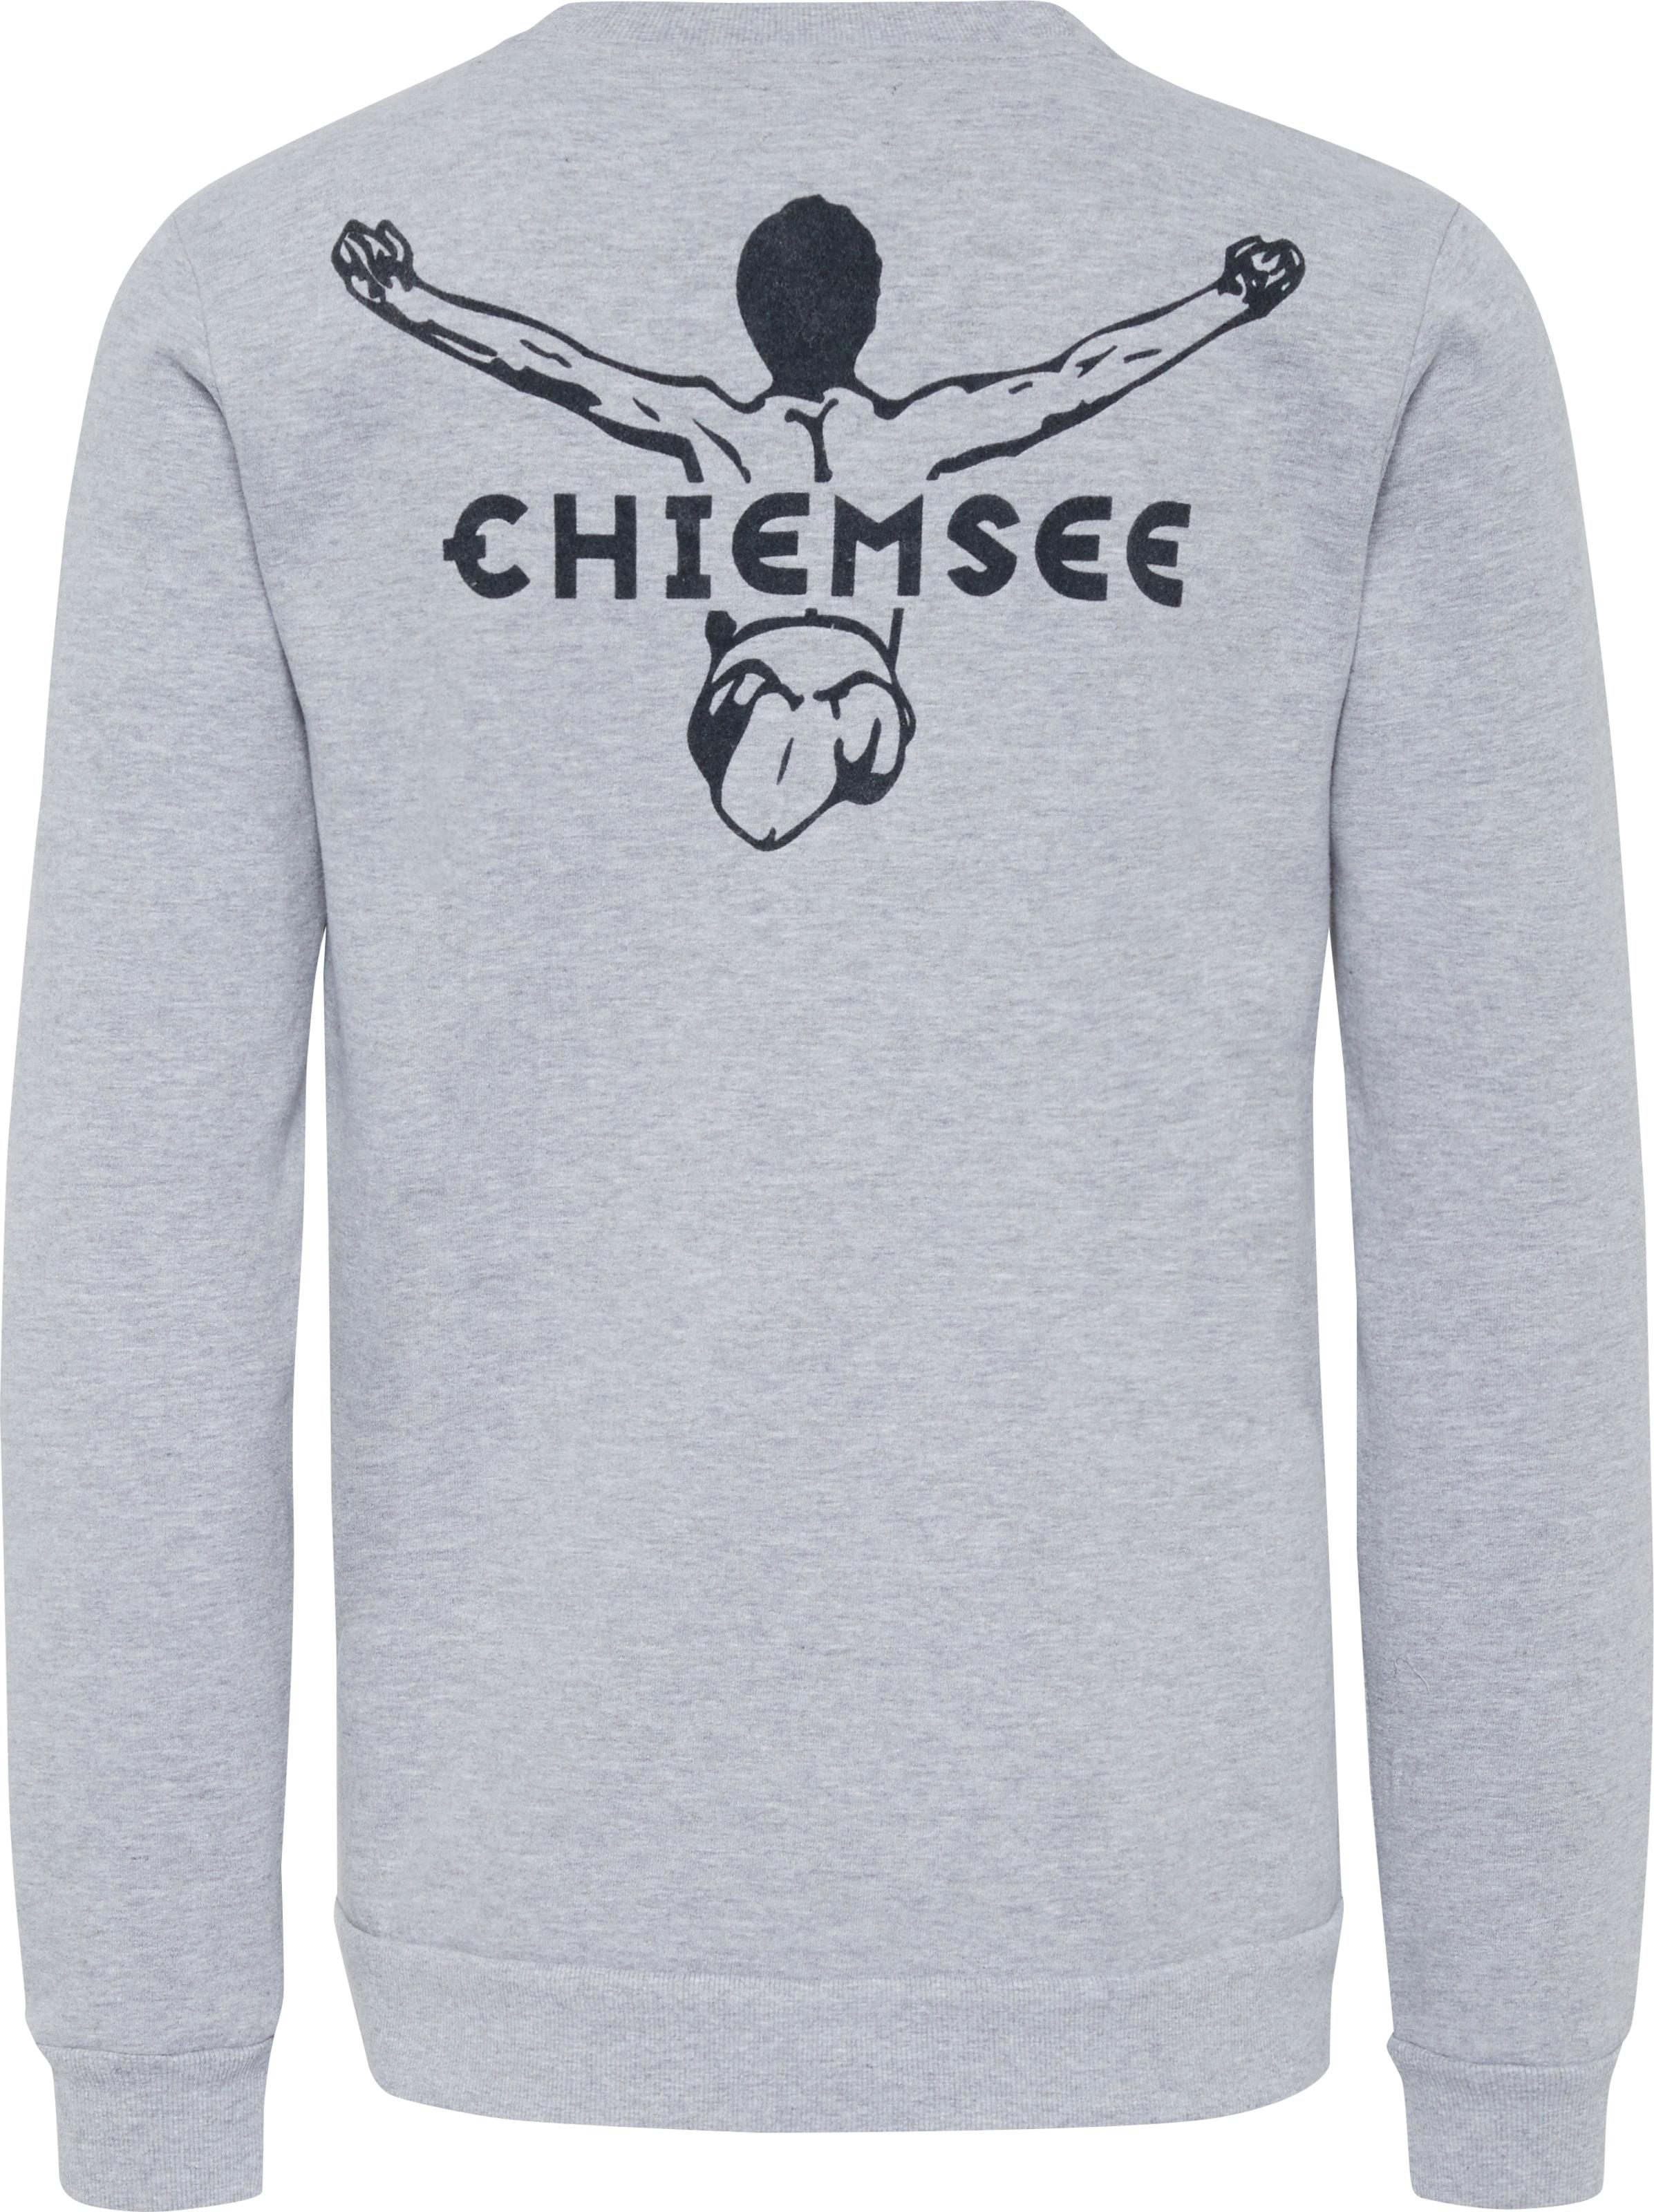 CHIEMSEE 'TENBY' Sweatshirt Men GOTS Rabatt Bestseller 3pi1HlEQ1P